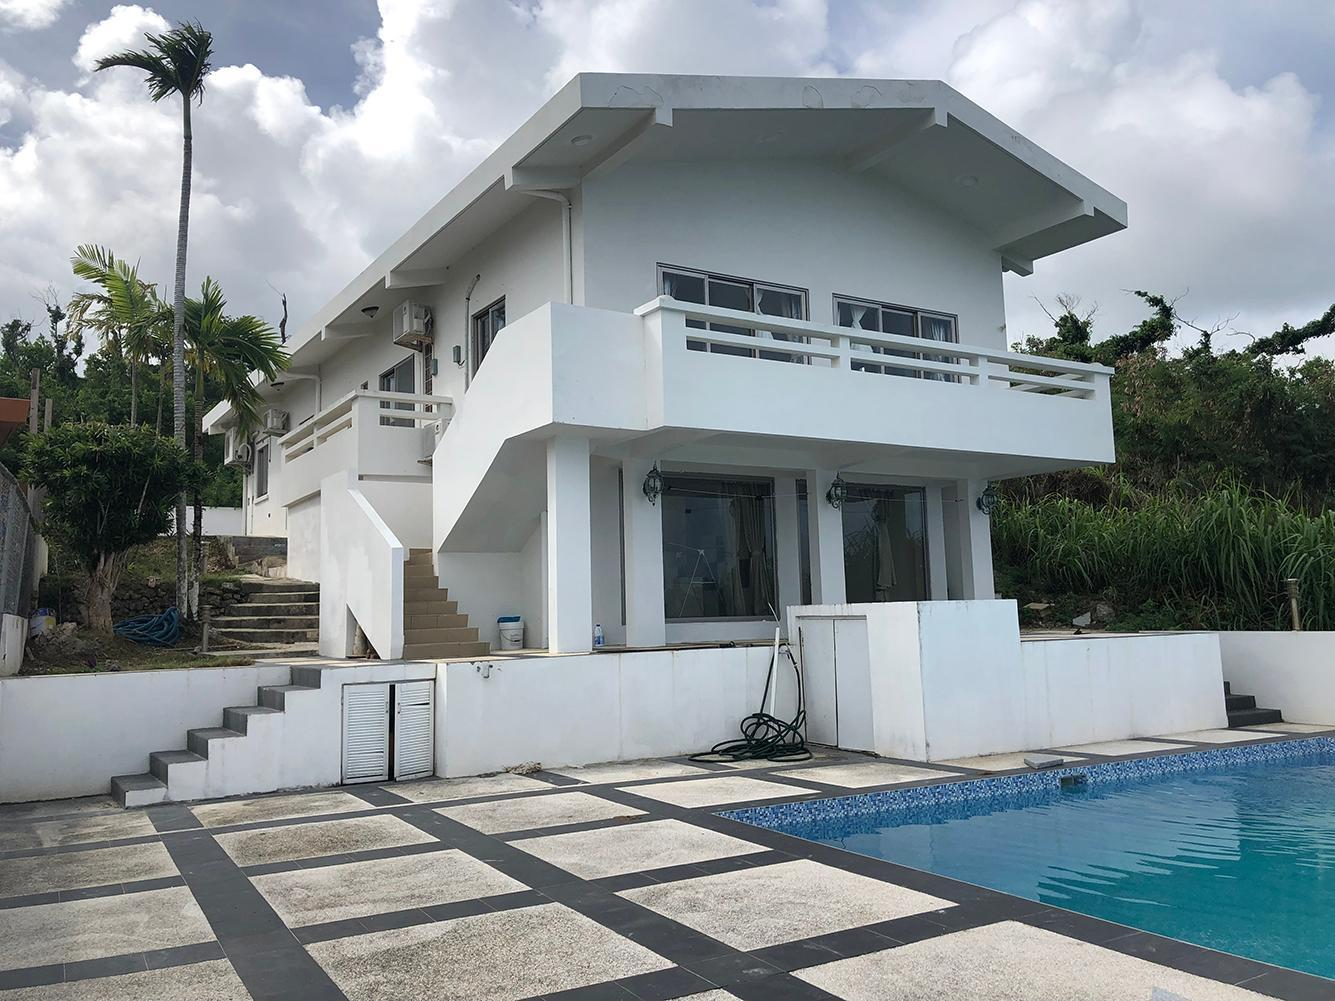 Saipan Angel Sunrise Sea View Swimming Pool Villa